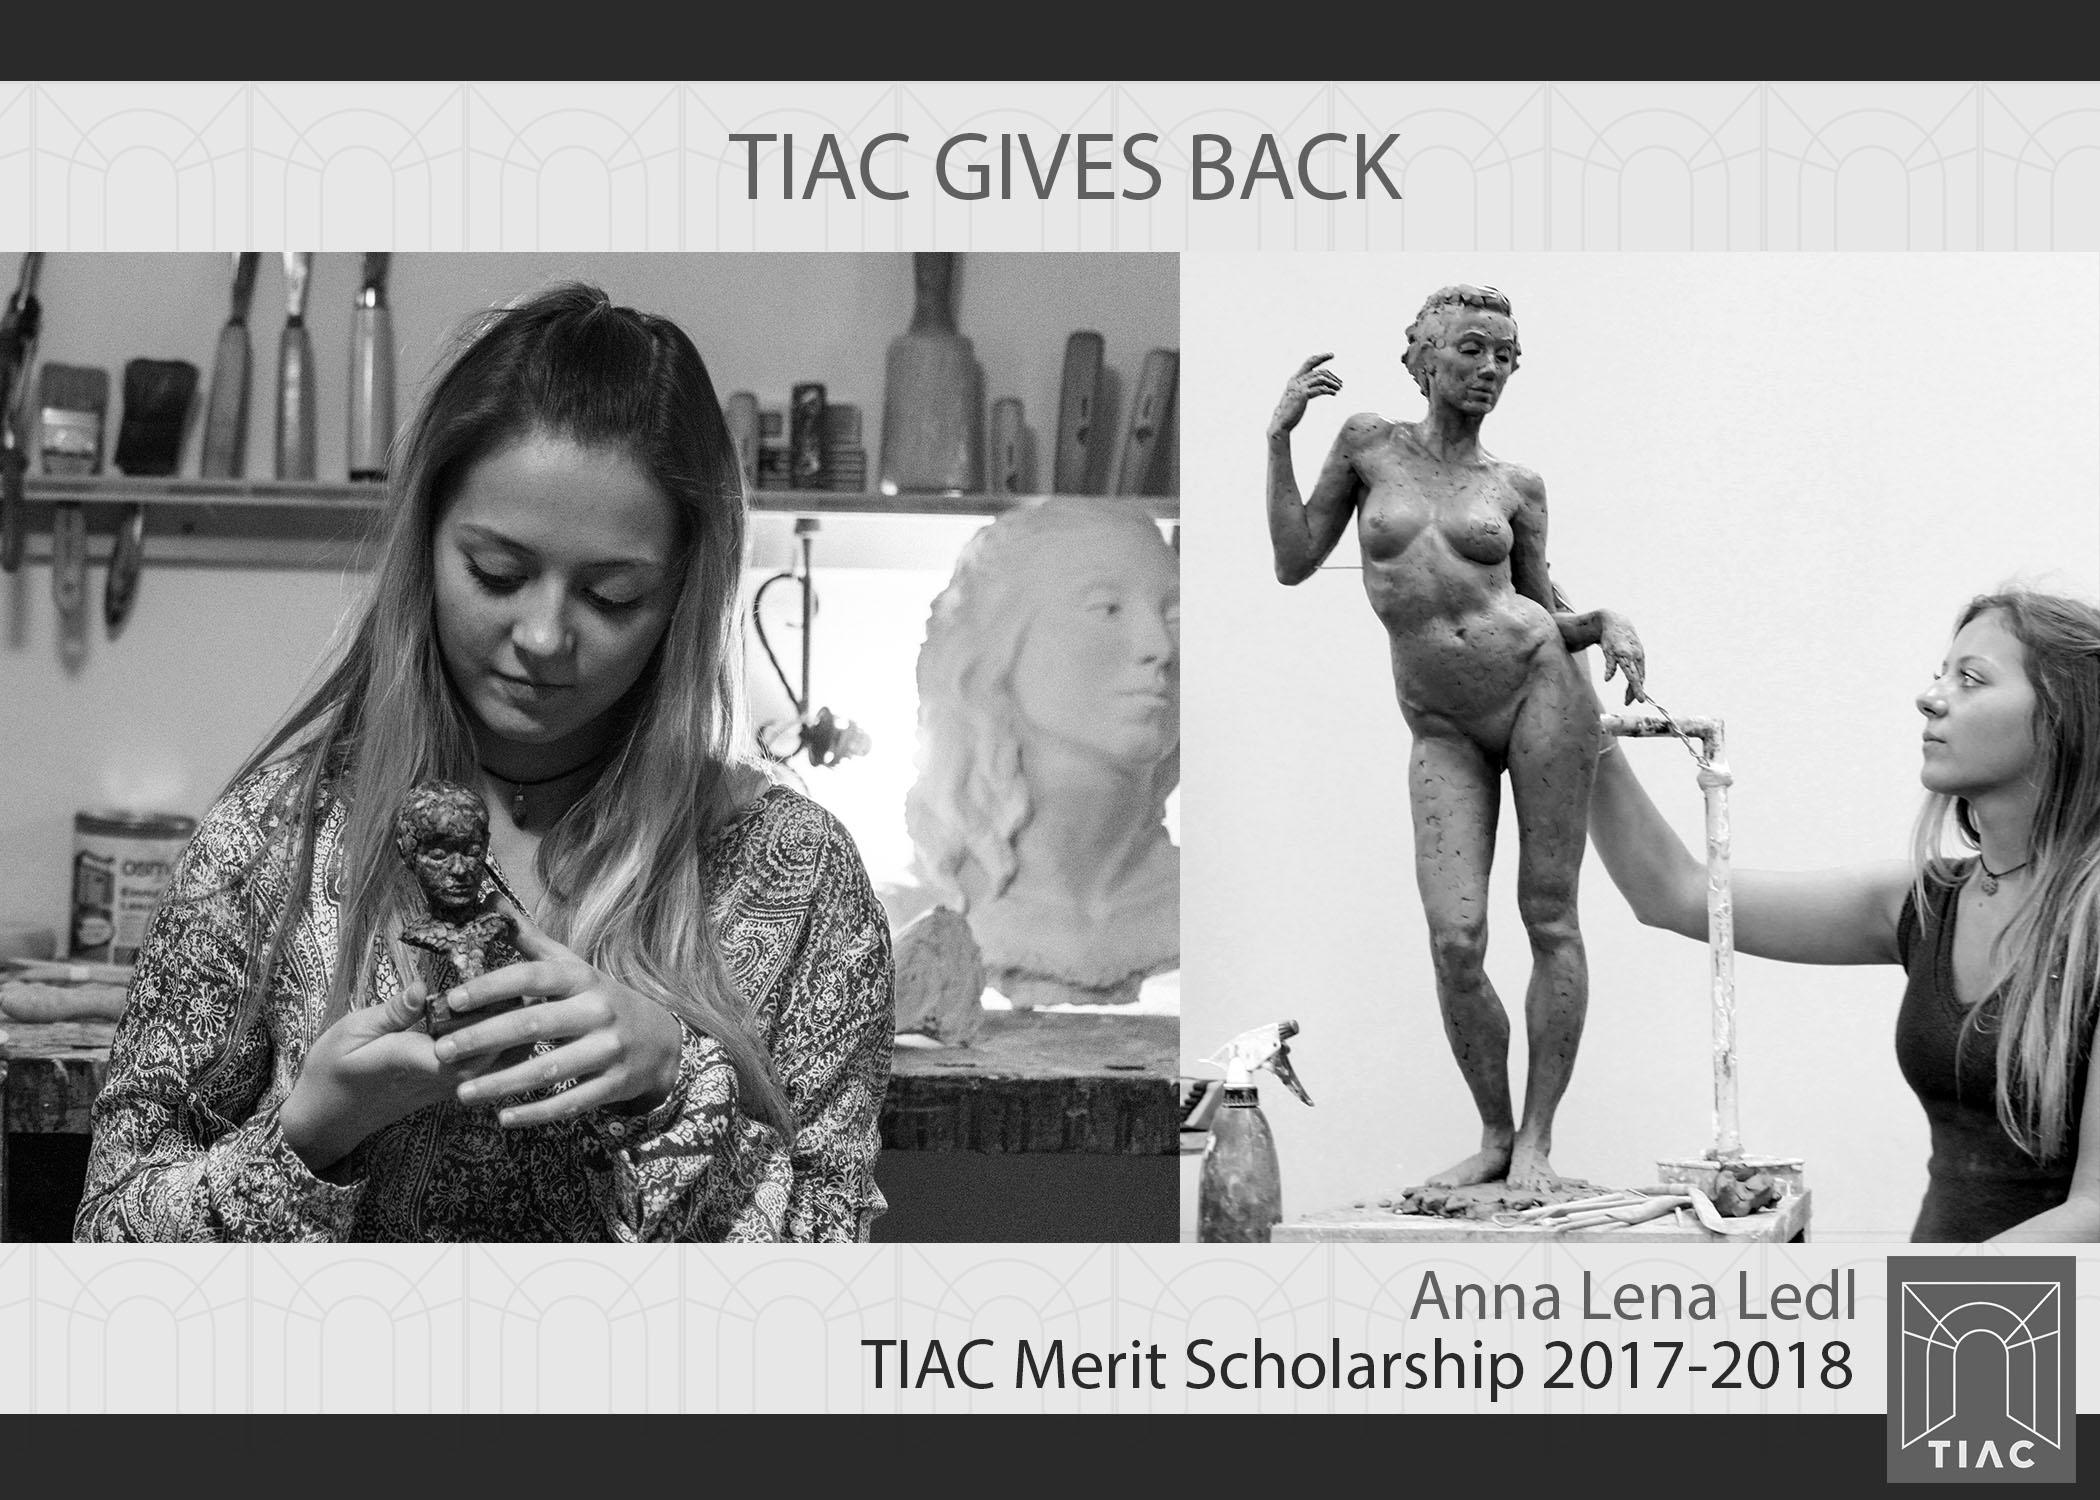 TIAc-Gives_Back_Scholarships-Anna Lena.jpg